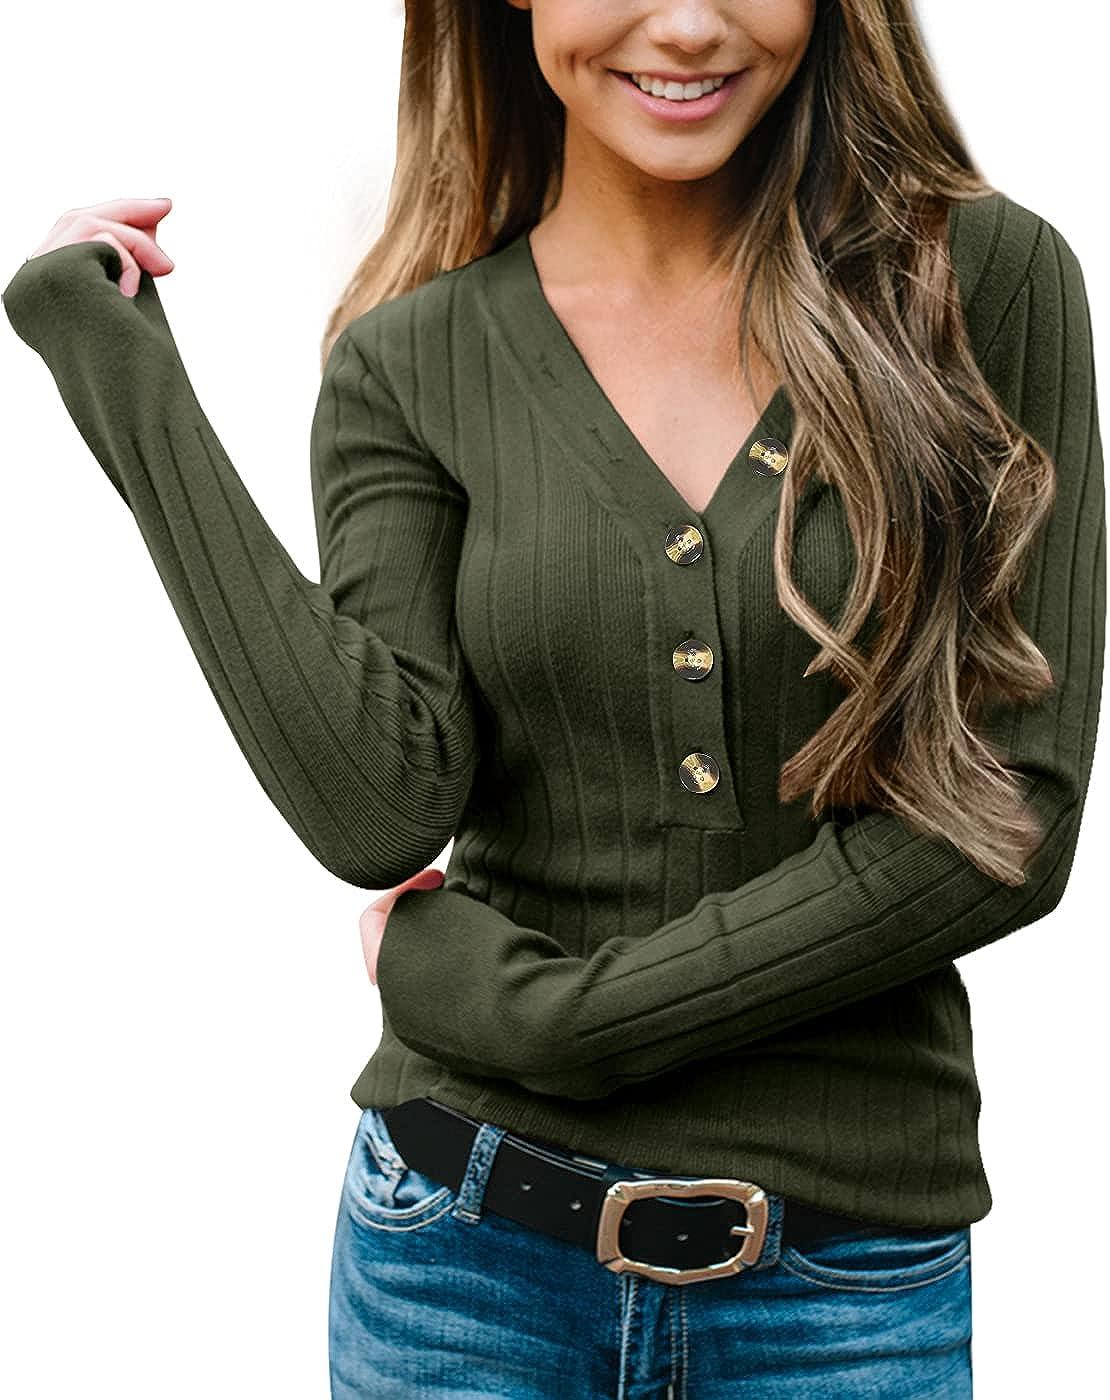 Spadehill Women's V Neck Button Up Long Sleeve Knit Sweater